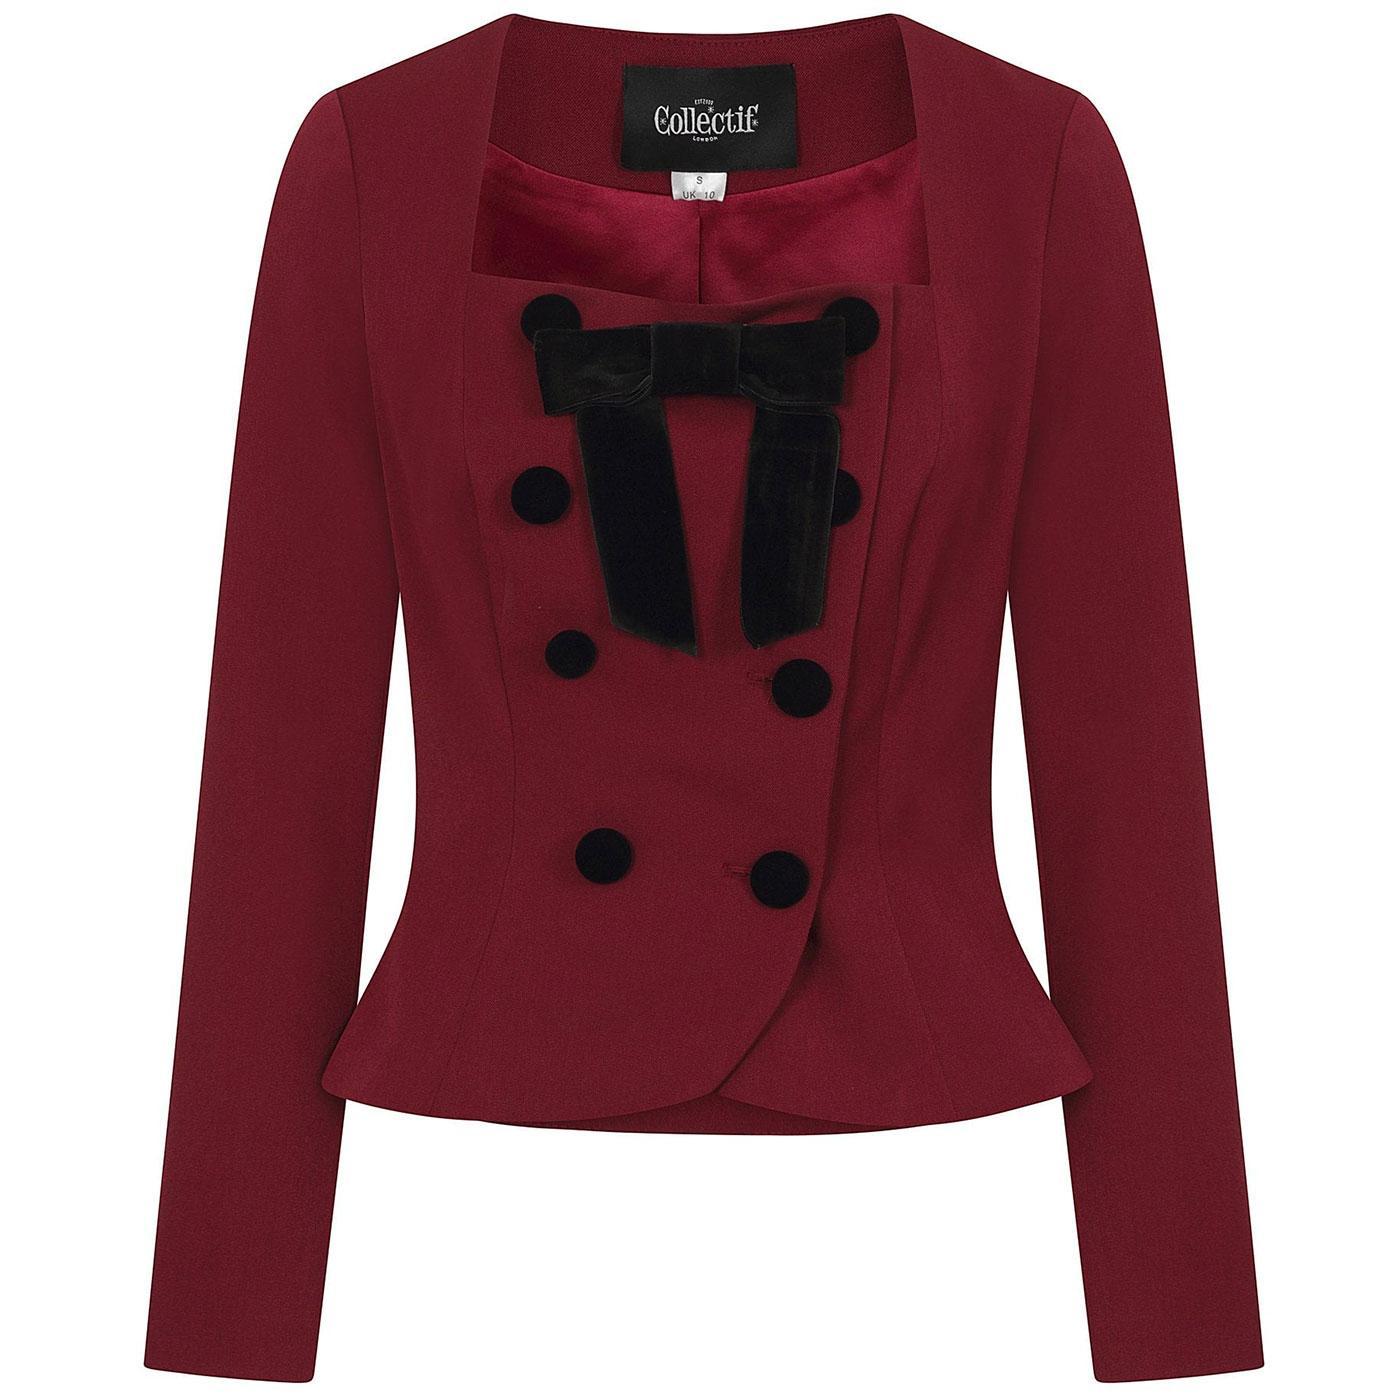 Agatha COLLECTIF 1940s Vintage Jacket in Burgundy